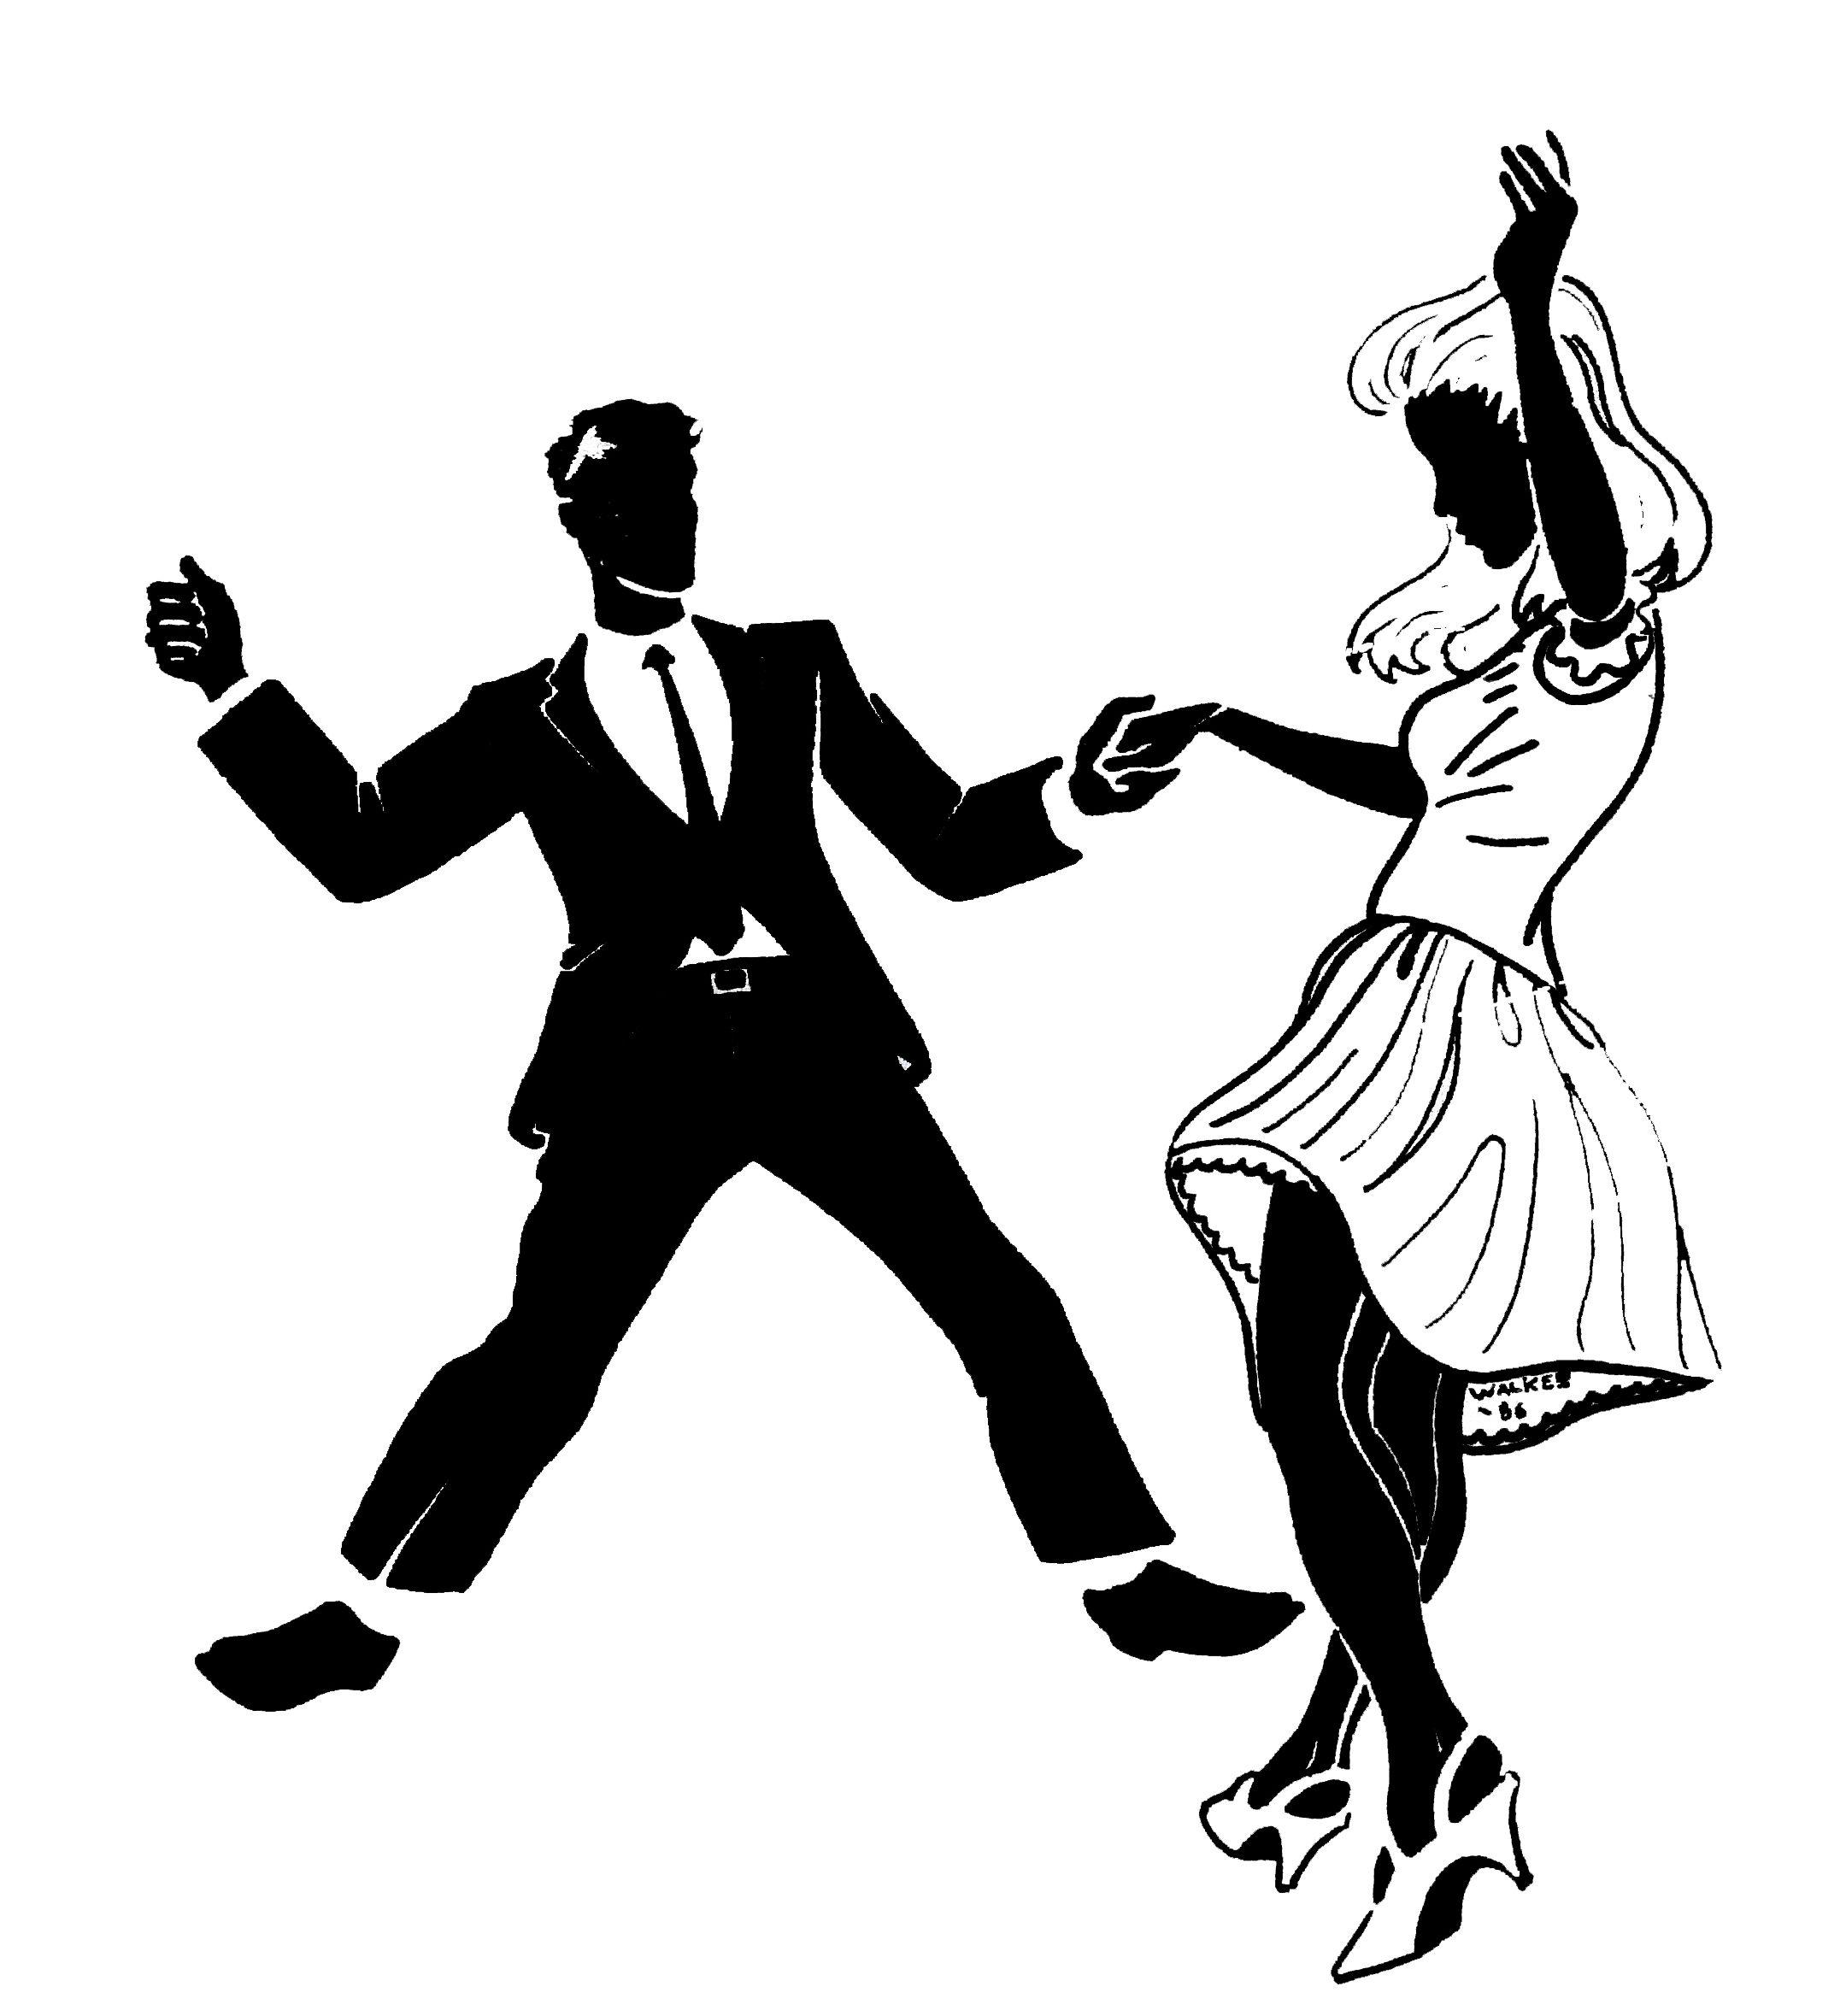 swing jazz - Szukaj w Google   Swing Style   Pinterest   Swing jazz ...